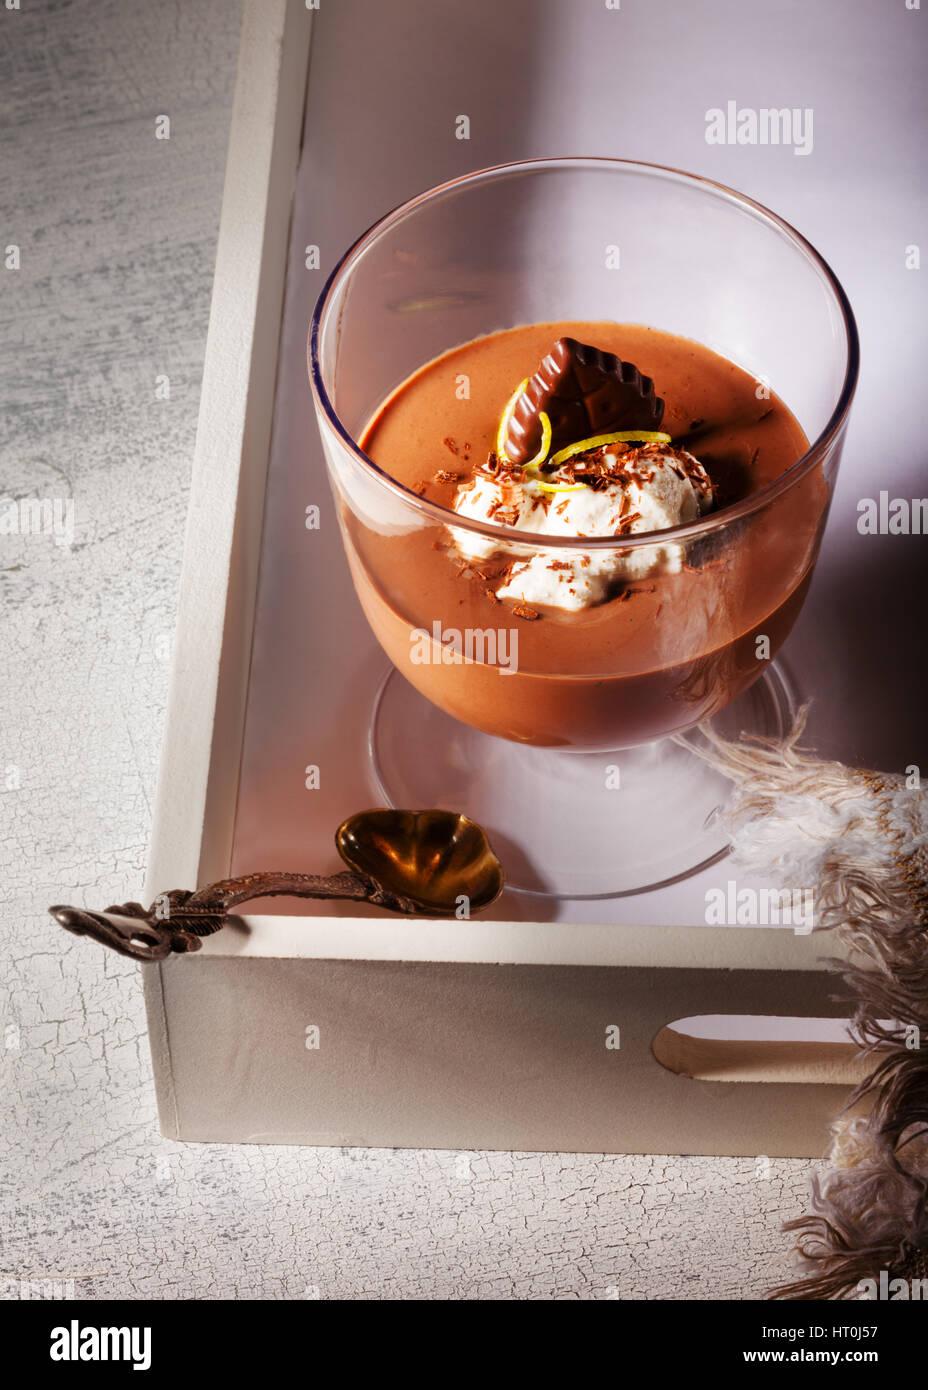 Schokoladen-Mousse Dessert Stockfoto